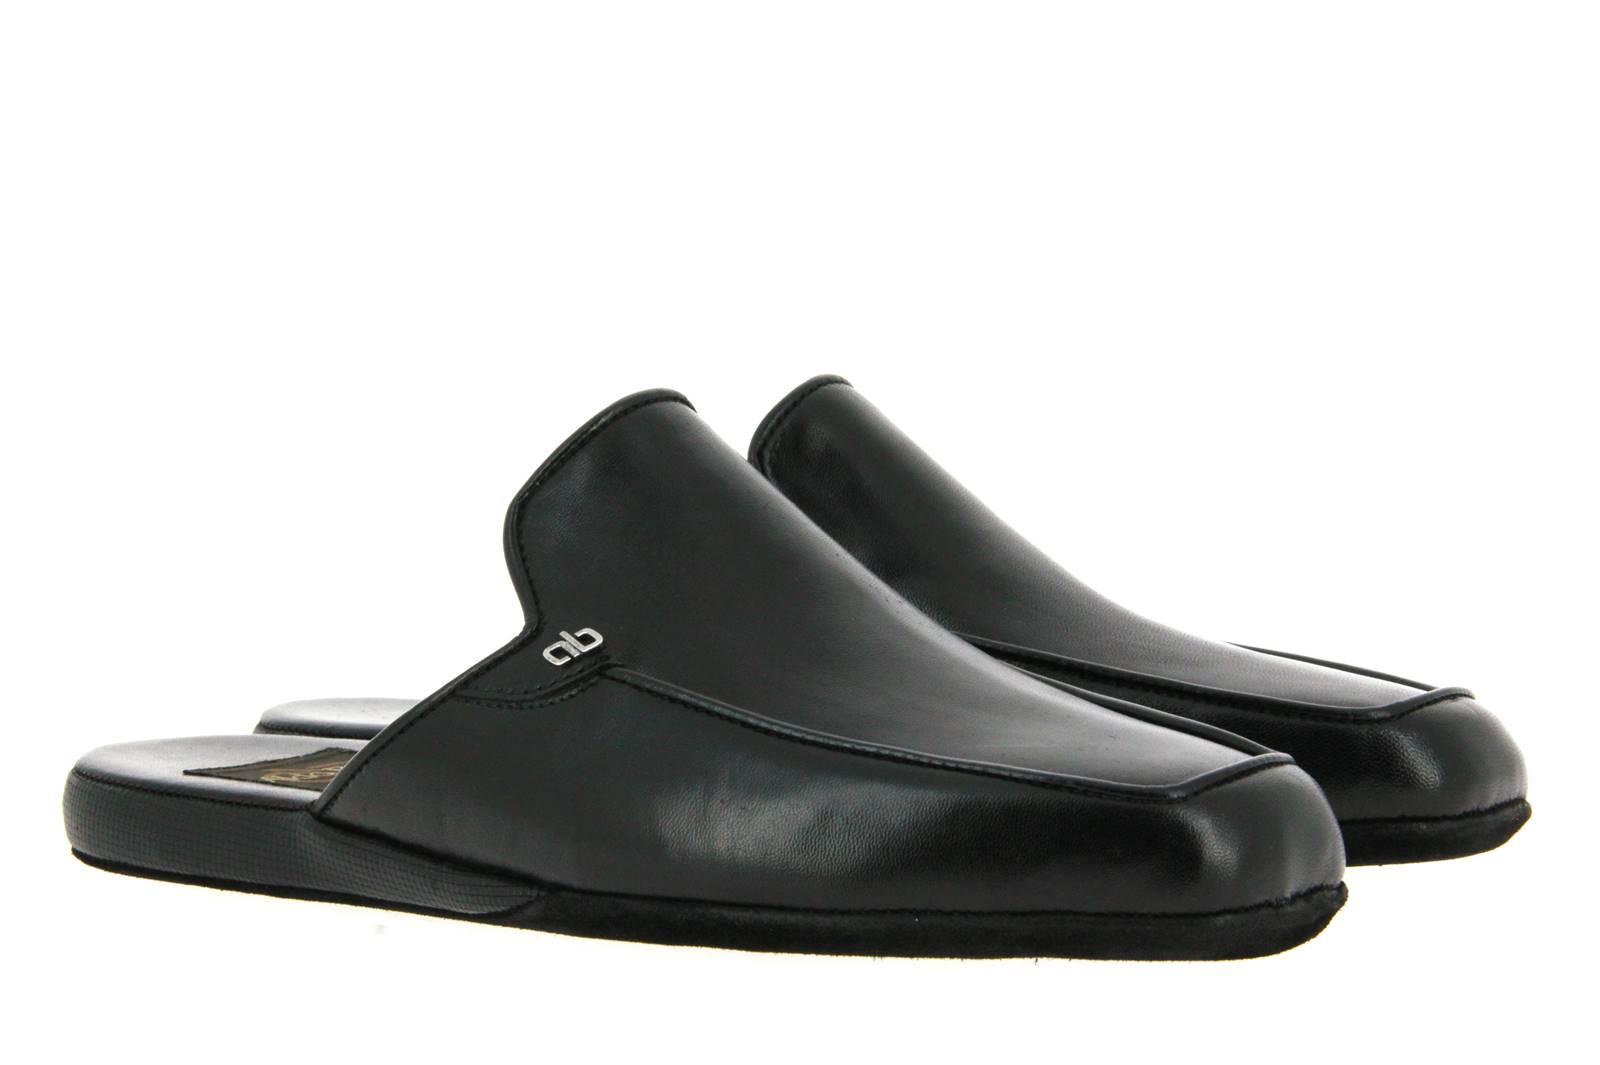 Aldo Bruè house slippers NAPPA NERO